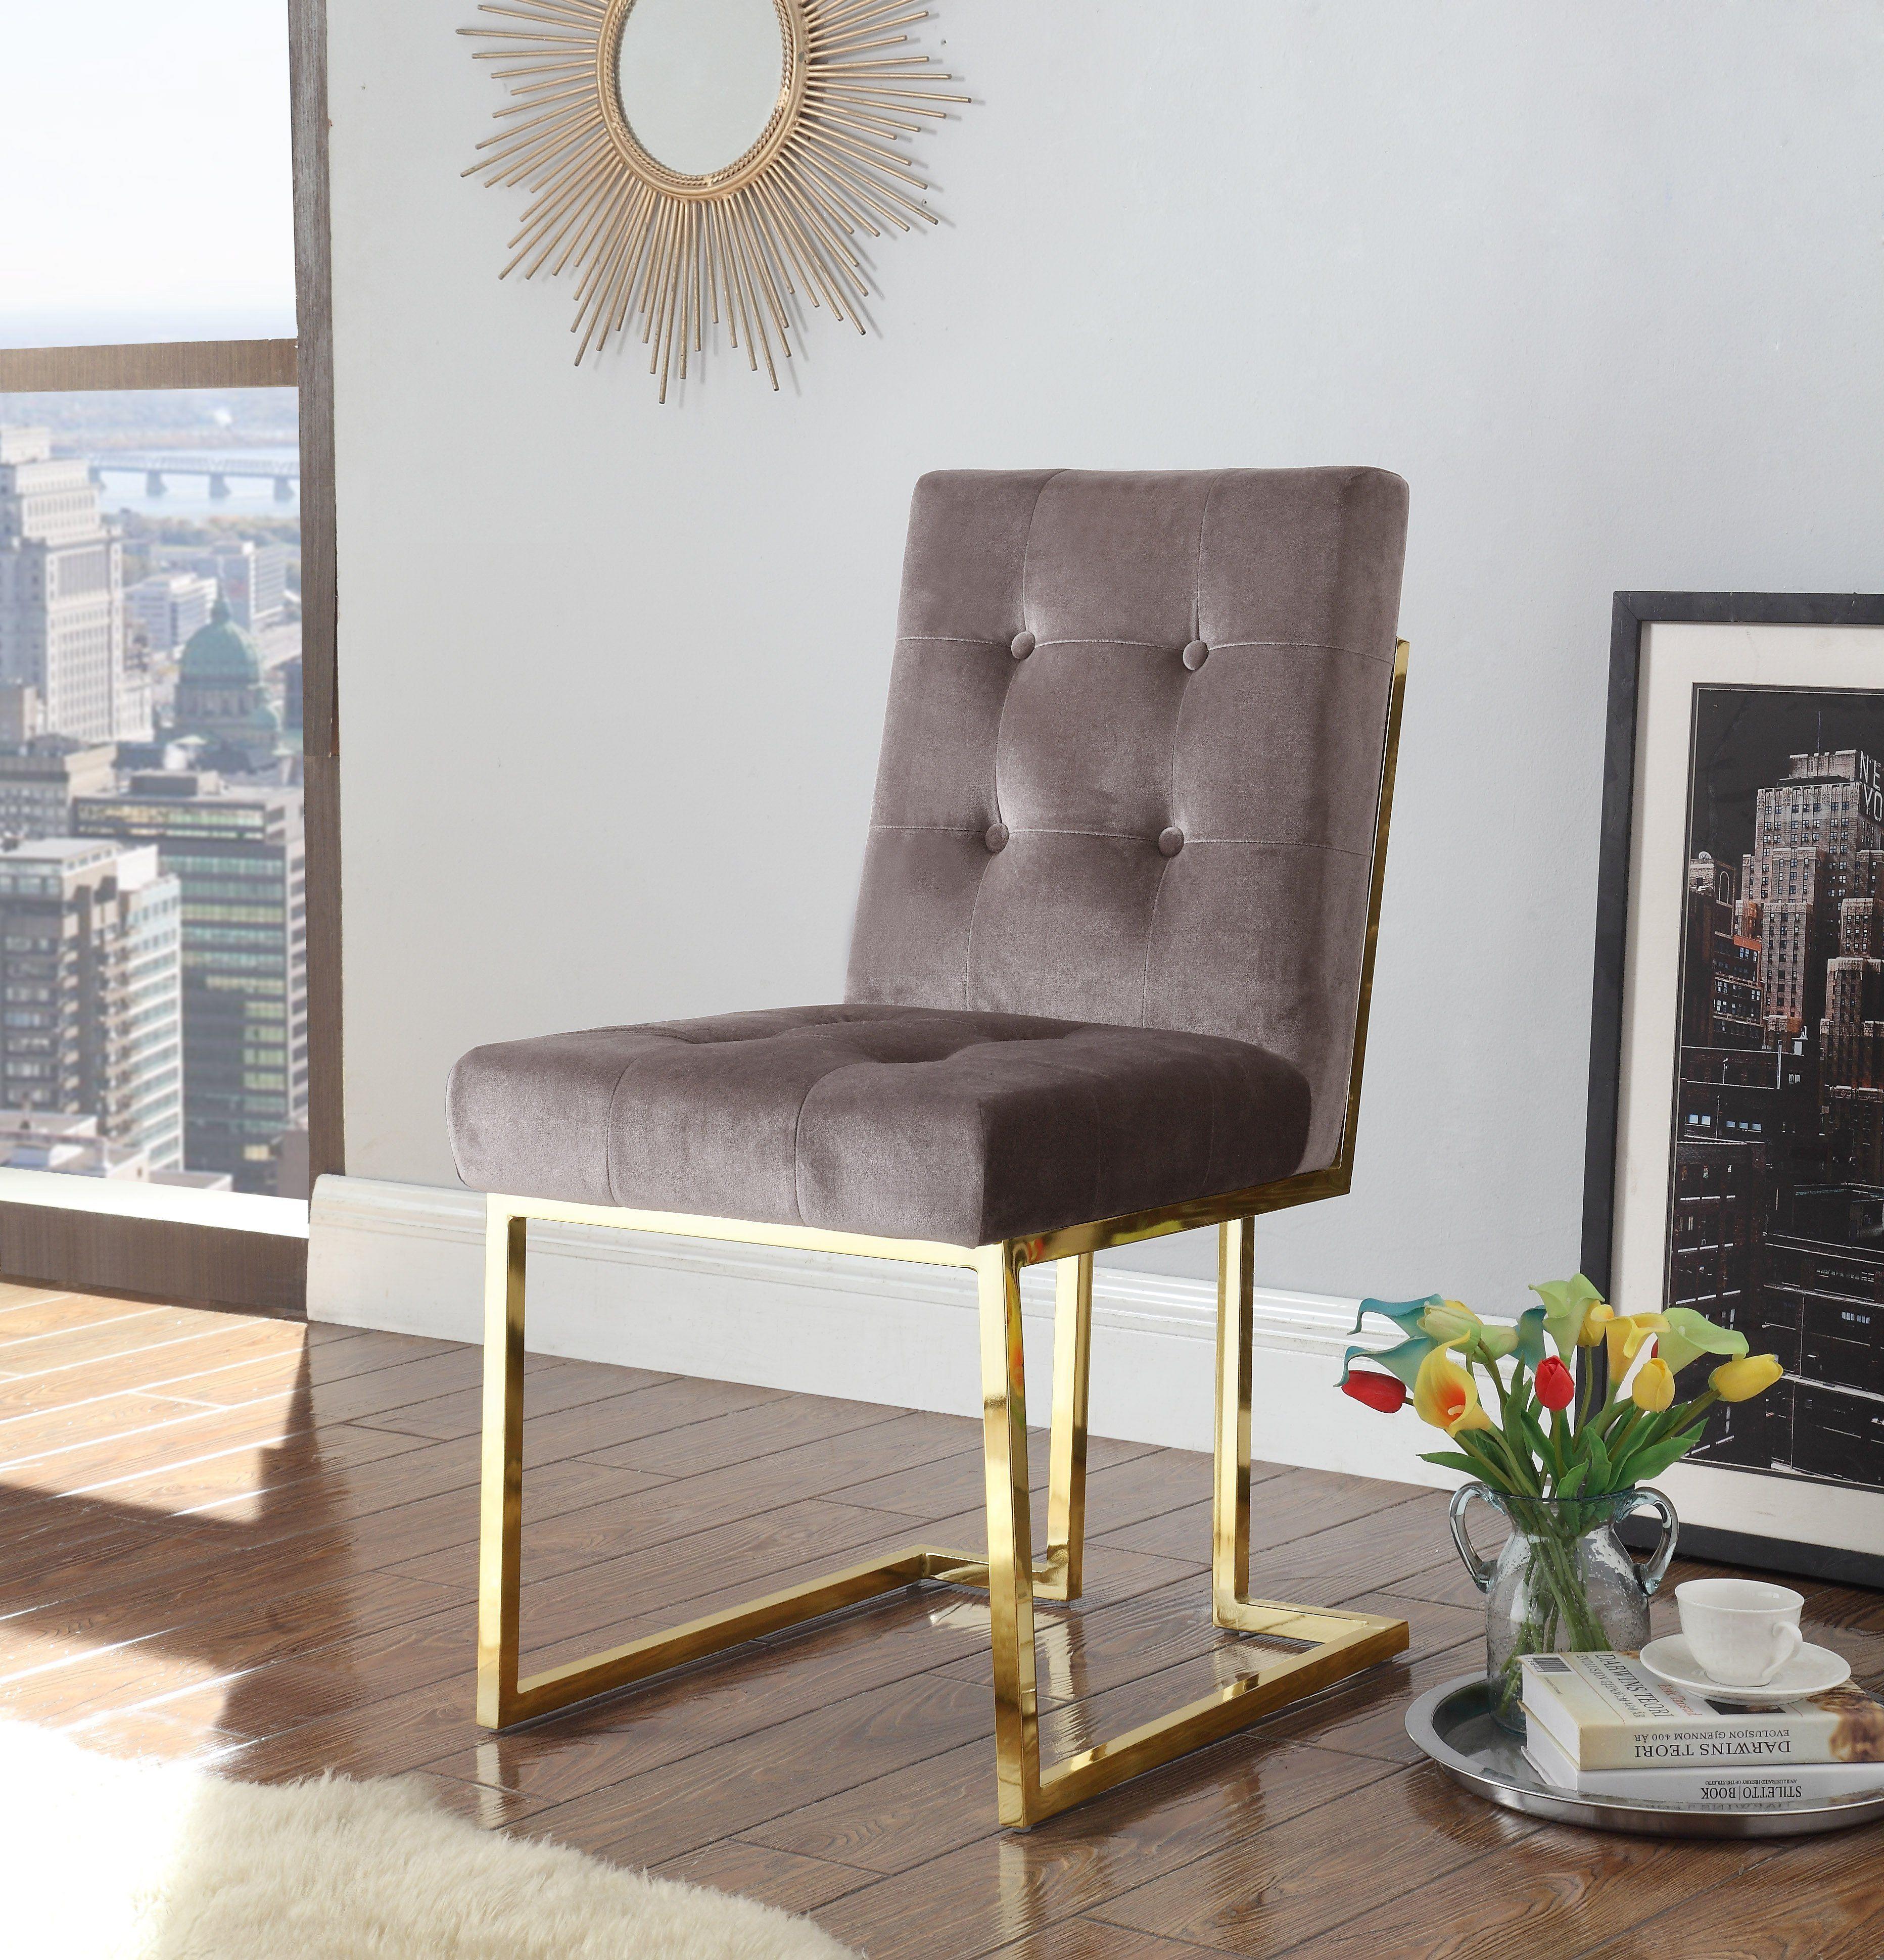 Liam Modern Contemporary Tufted Velvet Polished Brass Metal Frame